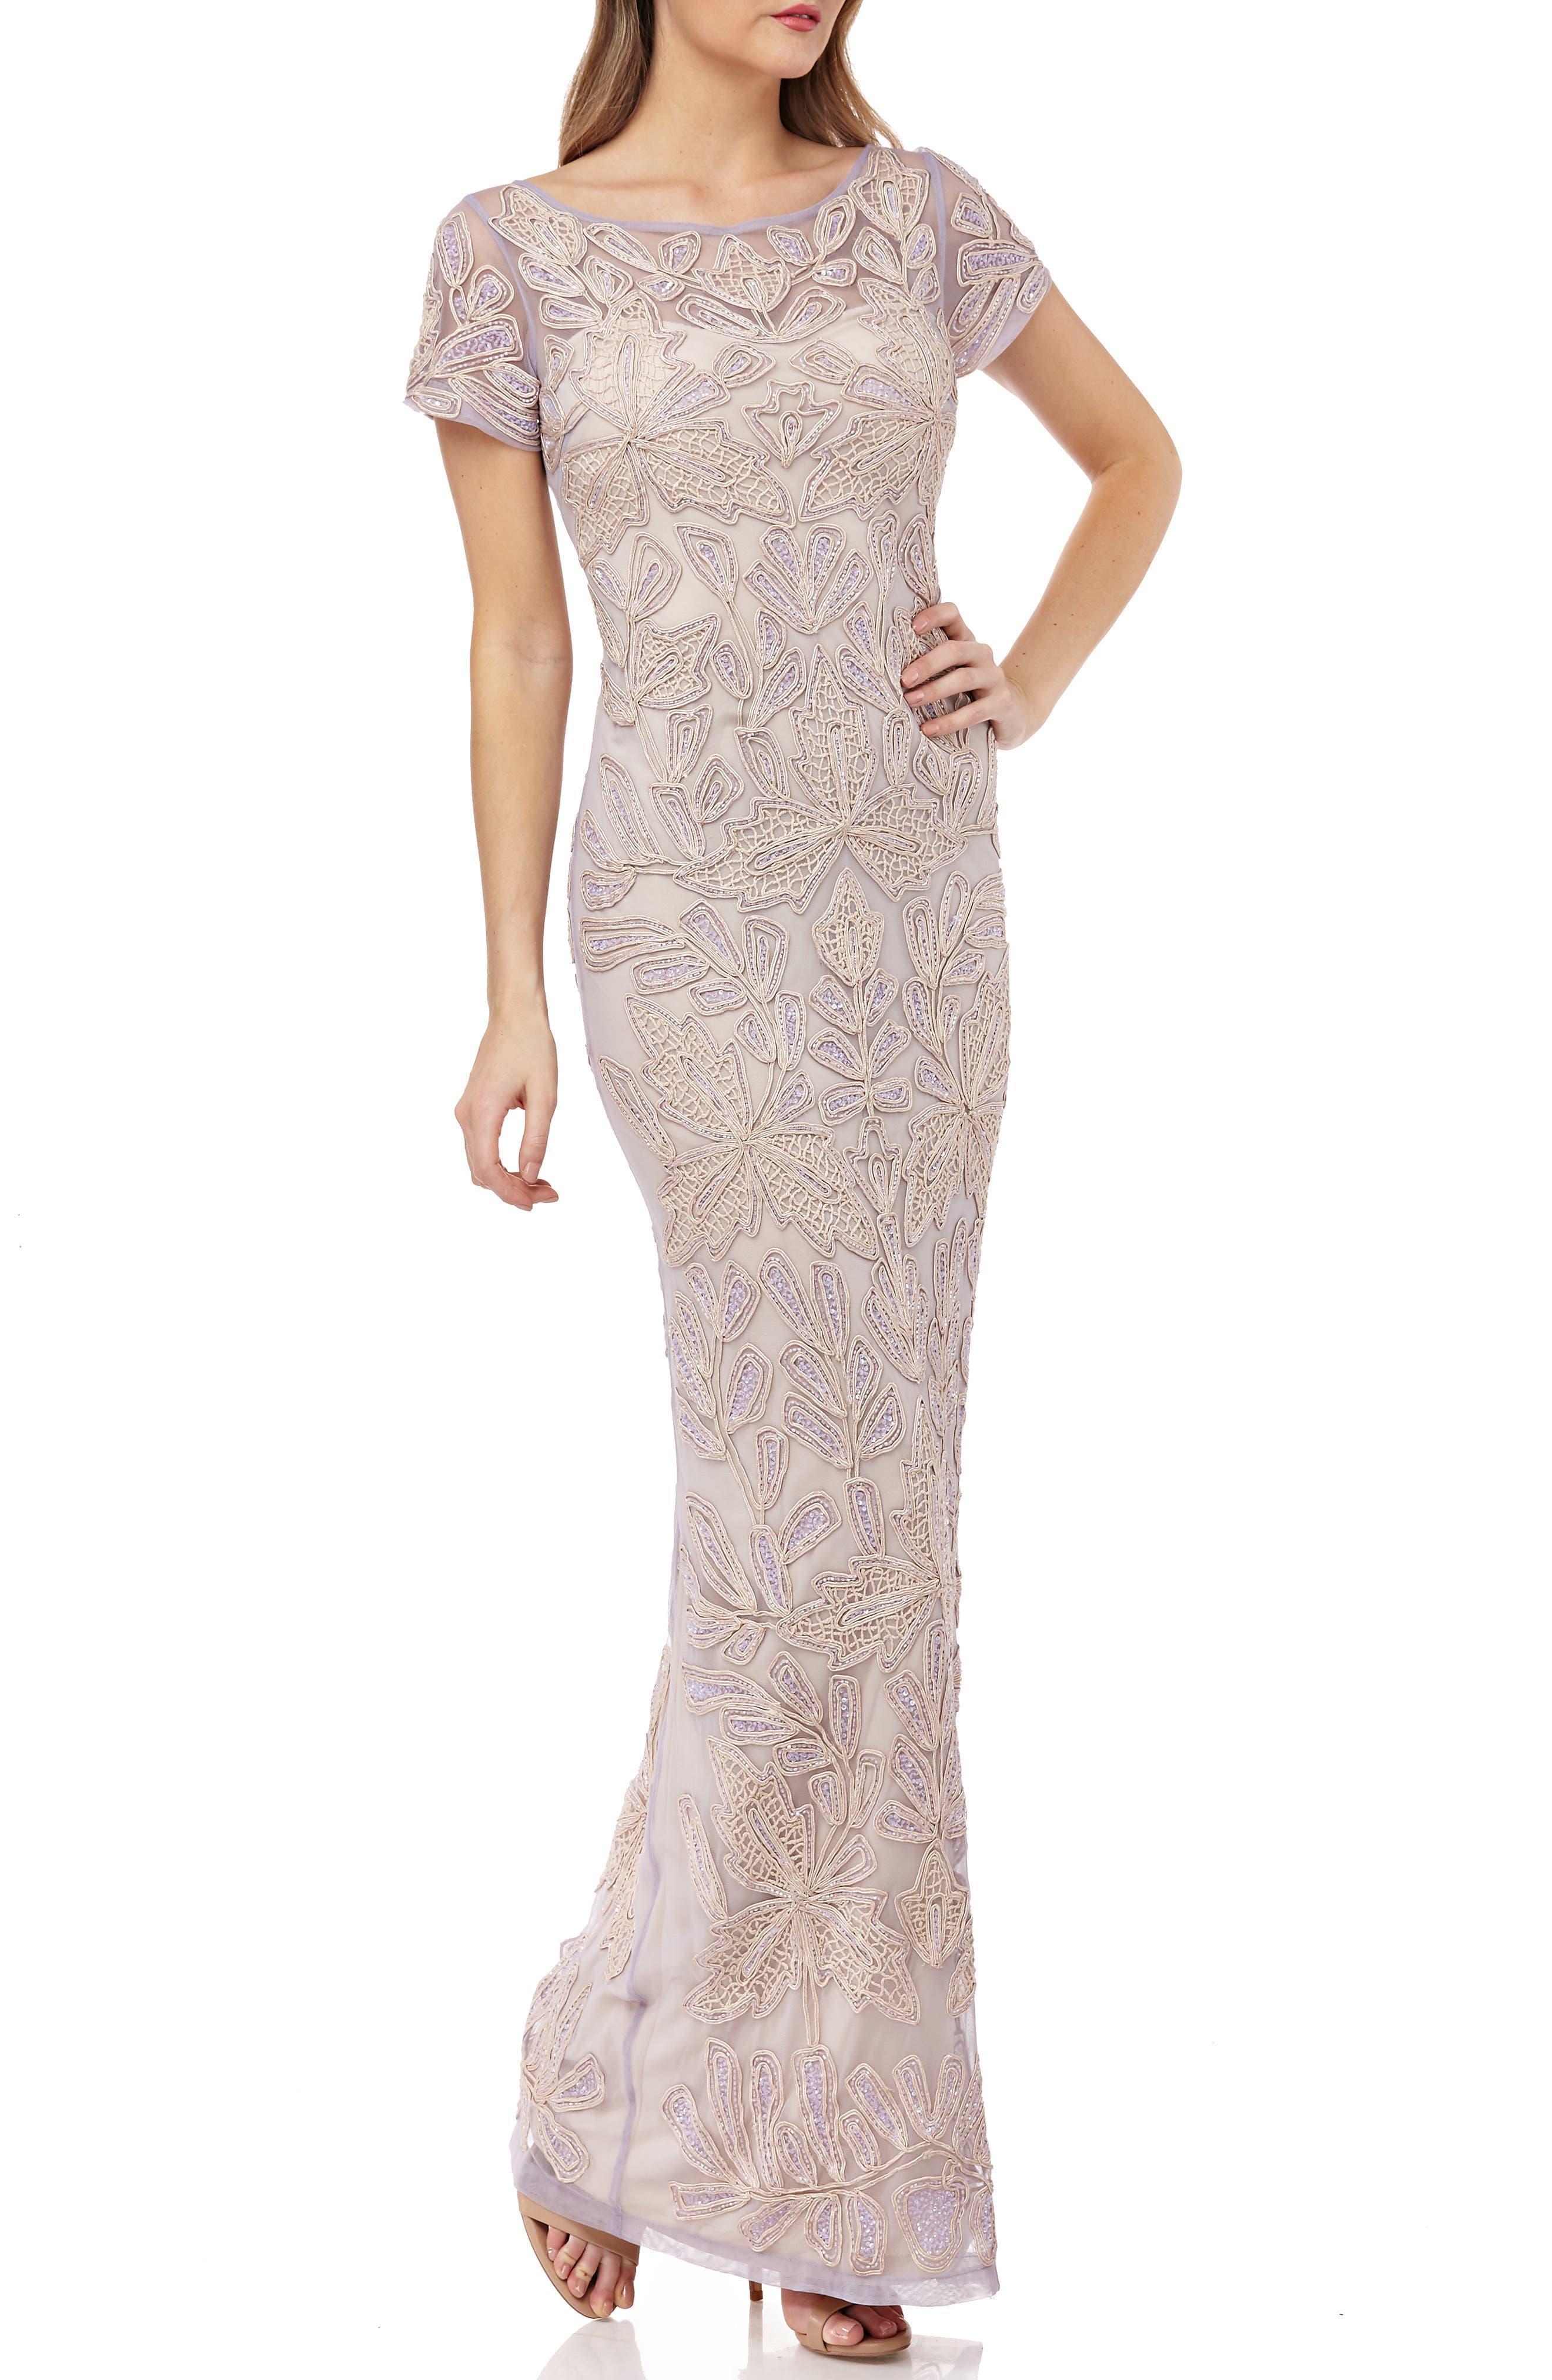 Js Collections Beaded Soutache Evening Dress, Purple